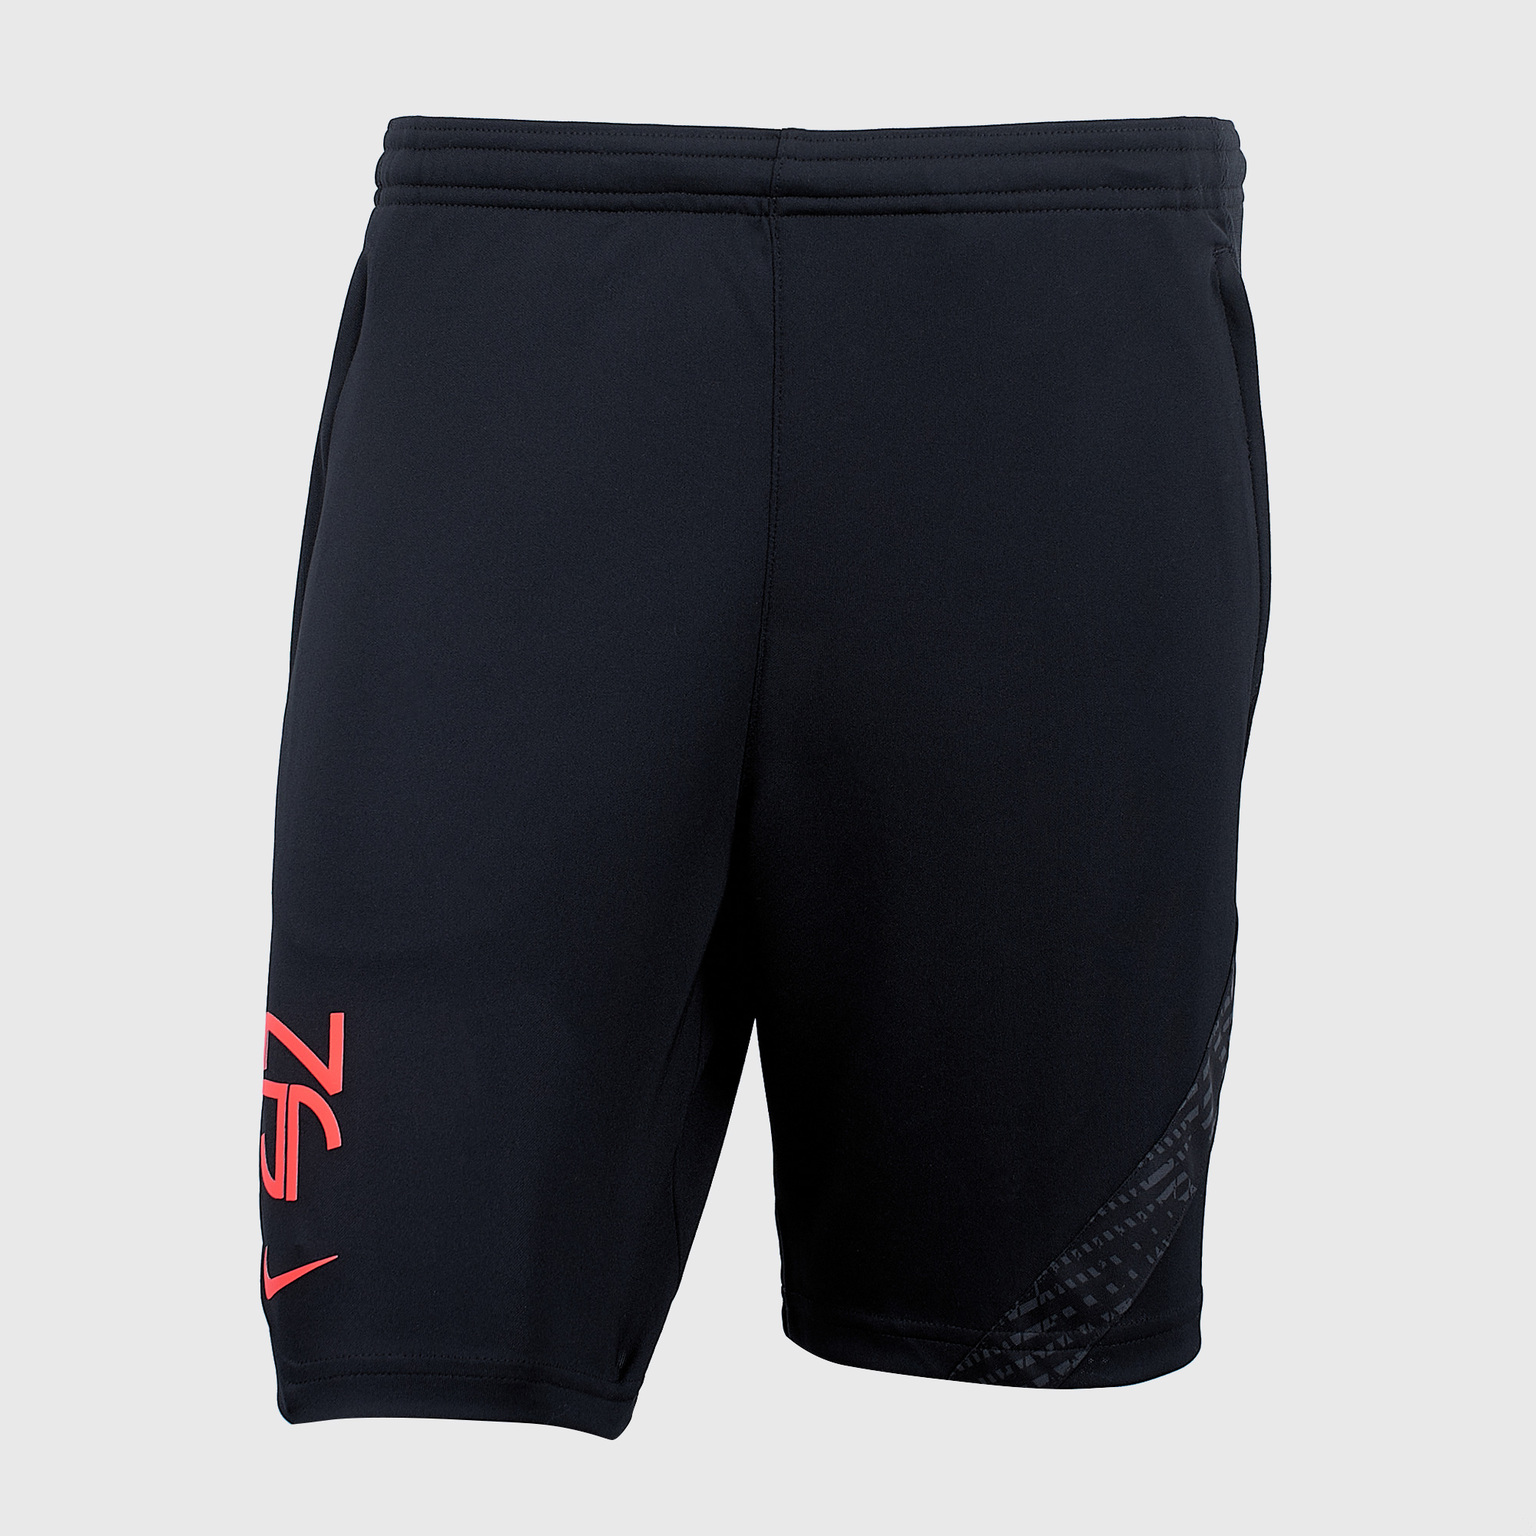 Шорты подростковые Nike Neymar Dry Short CD2235-010 футболка подростковая nike neymar tee hero cd0174 010